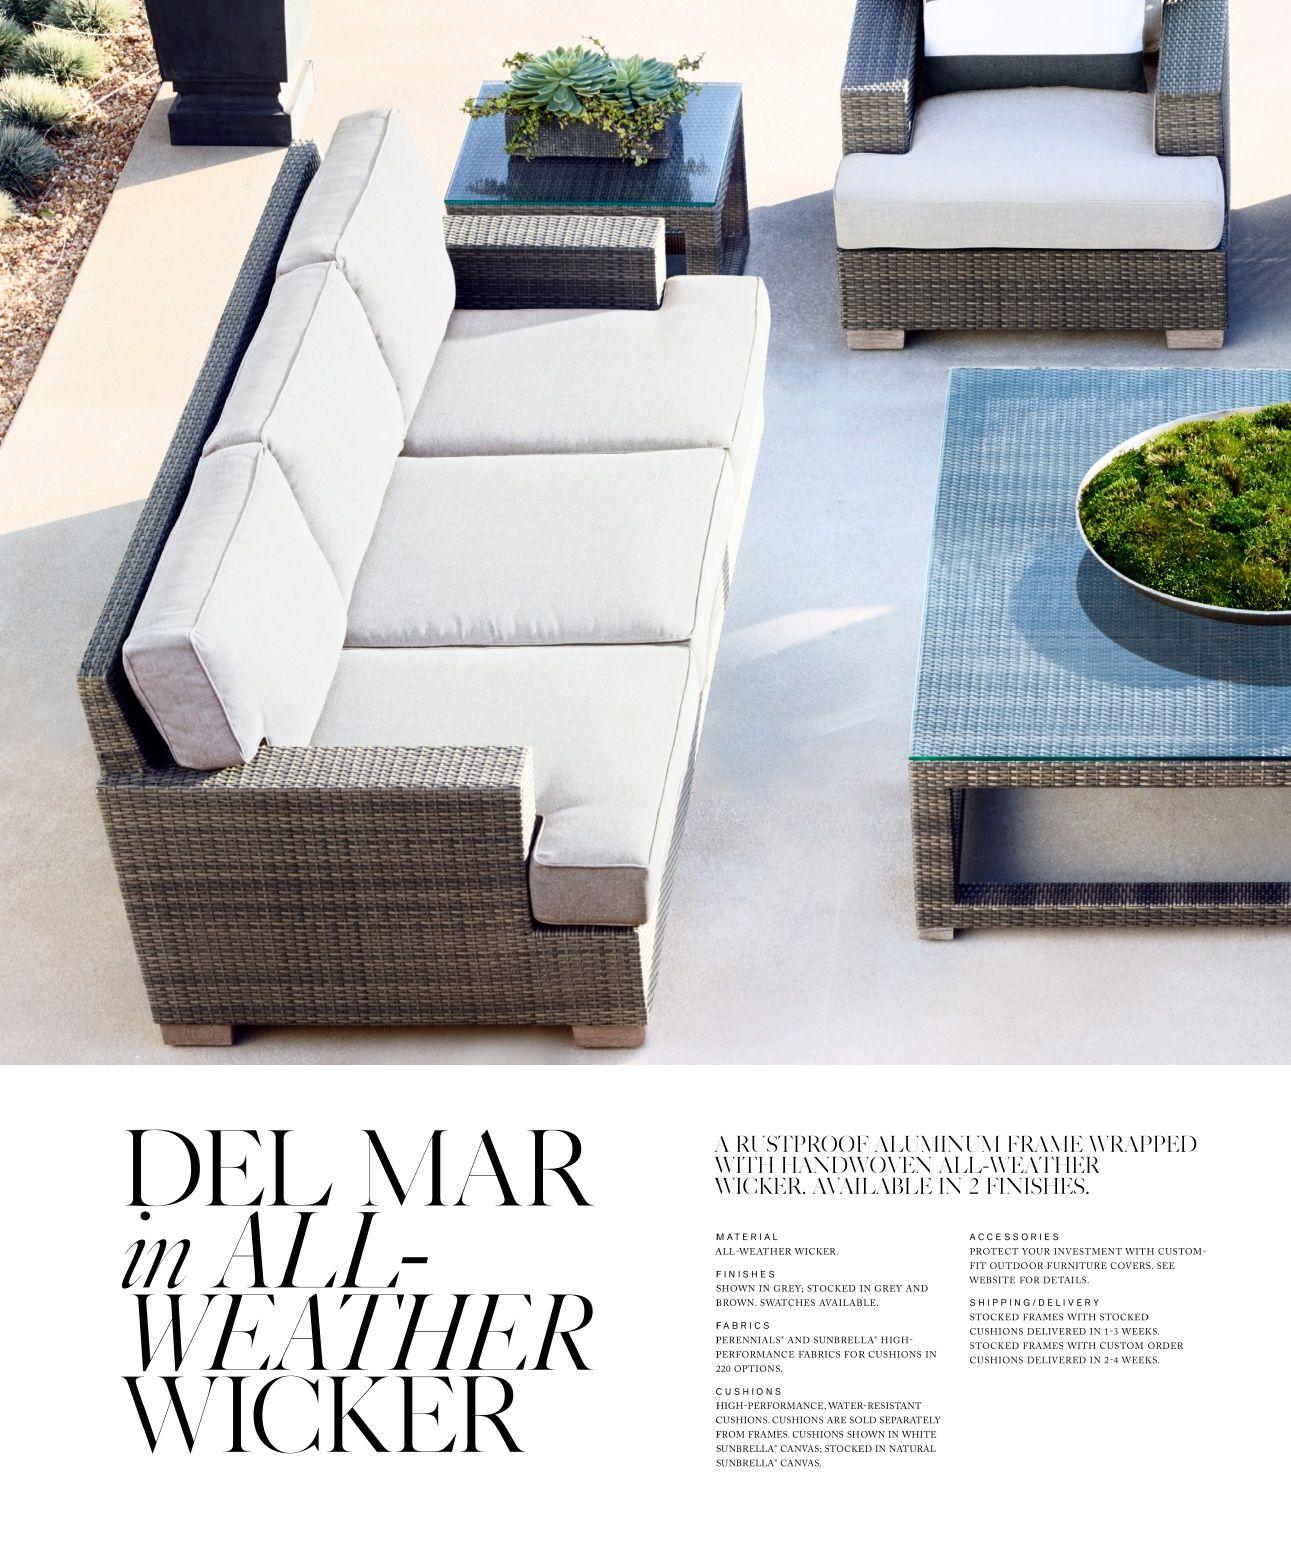 Enjoyable Rh Source Books Sunbrella Pillows Outdoor Furniture Sets Download Free Architecture Designs Scobabritishbridgeorg